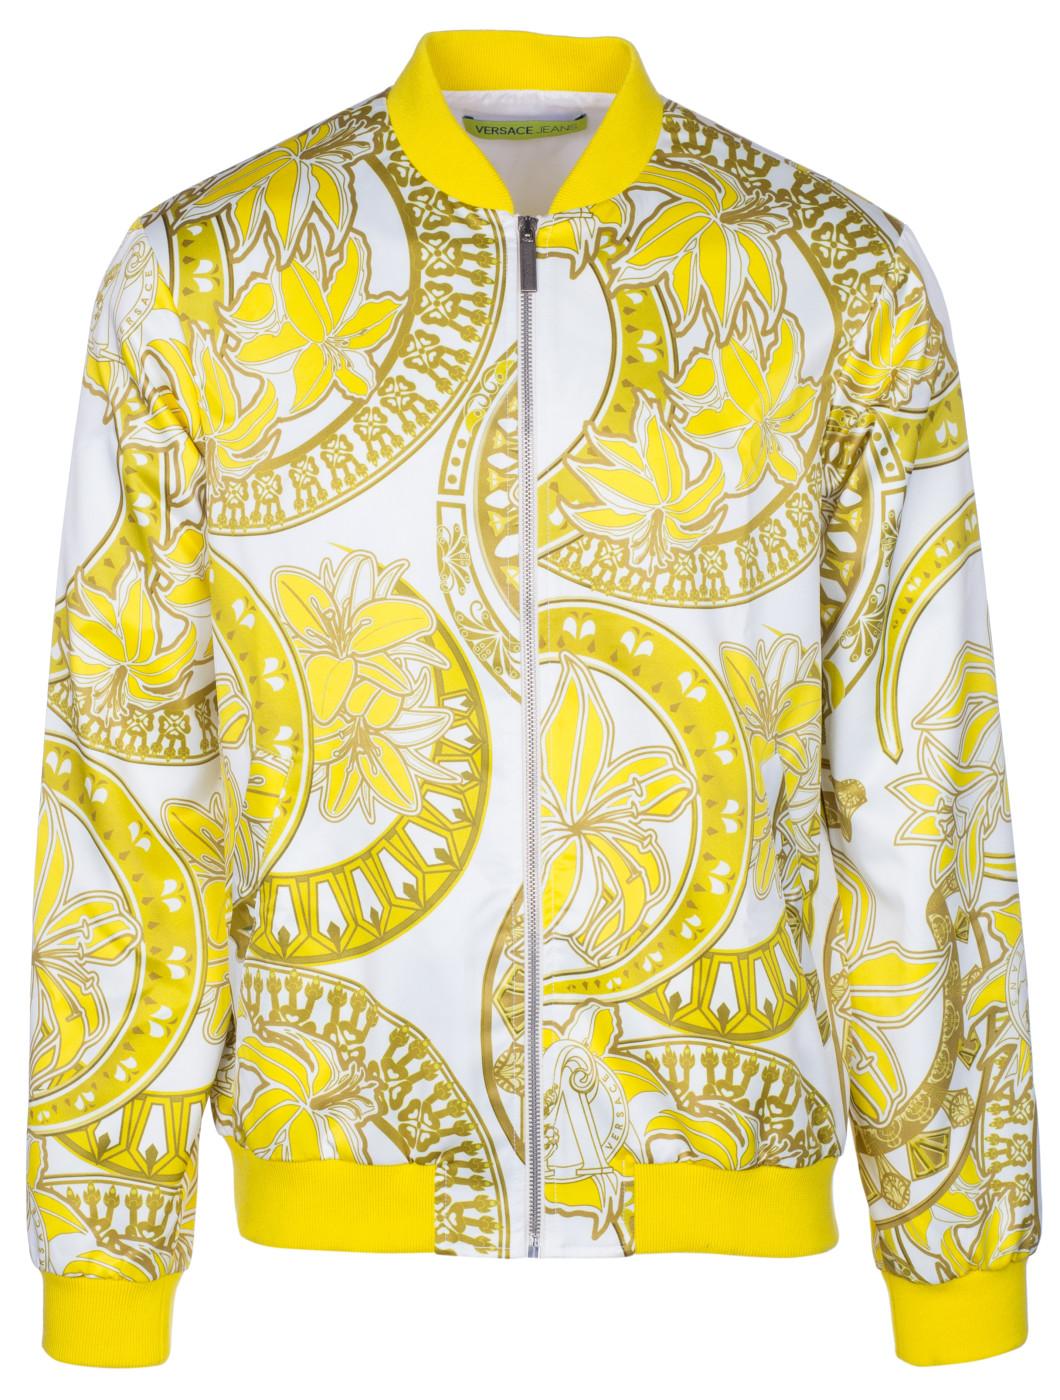 7f181ea016 Versace Jeans Men's Floral Print Zip Up Lightweight Bomber Jacket